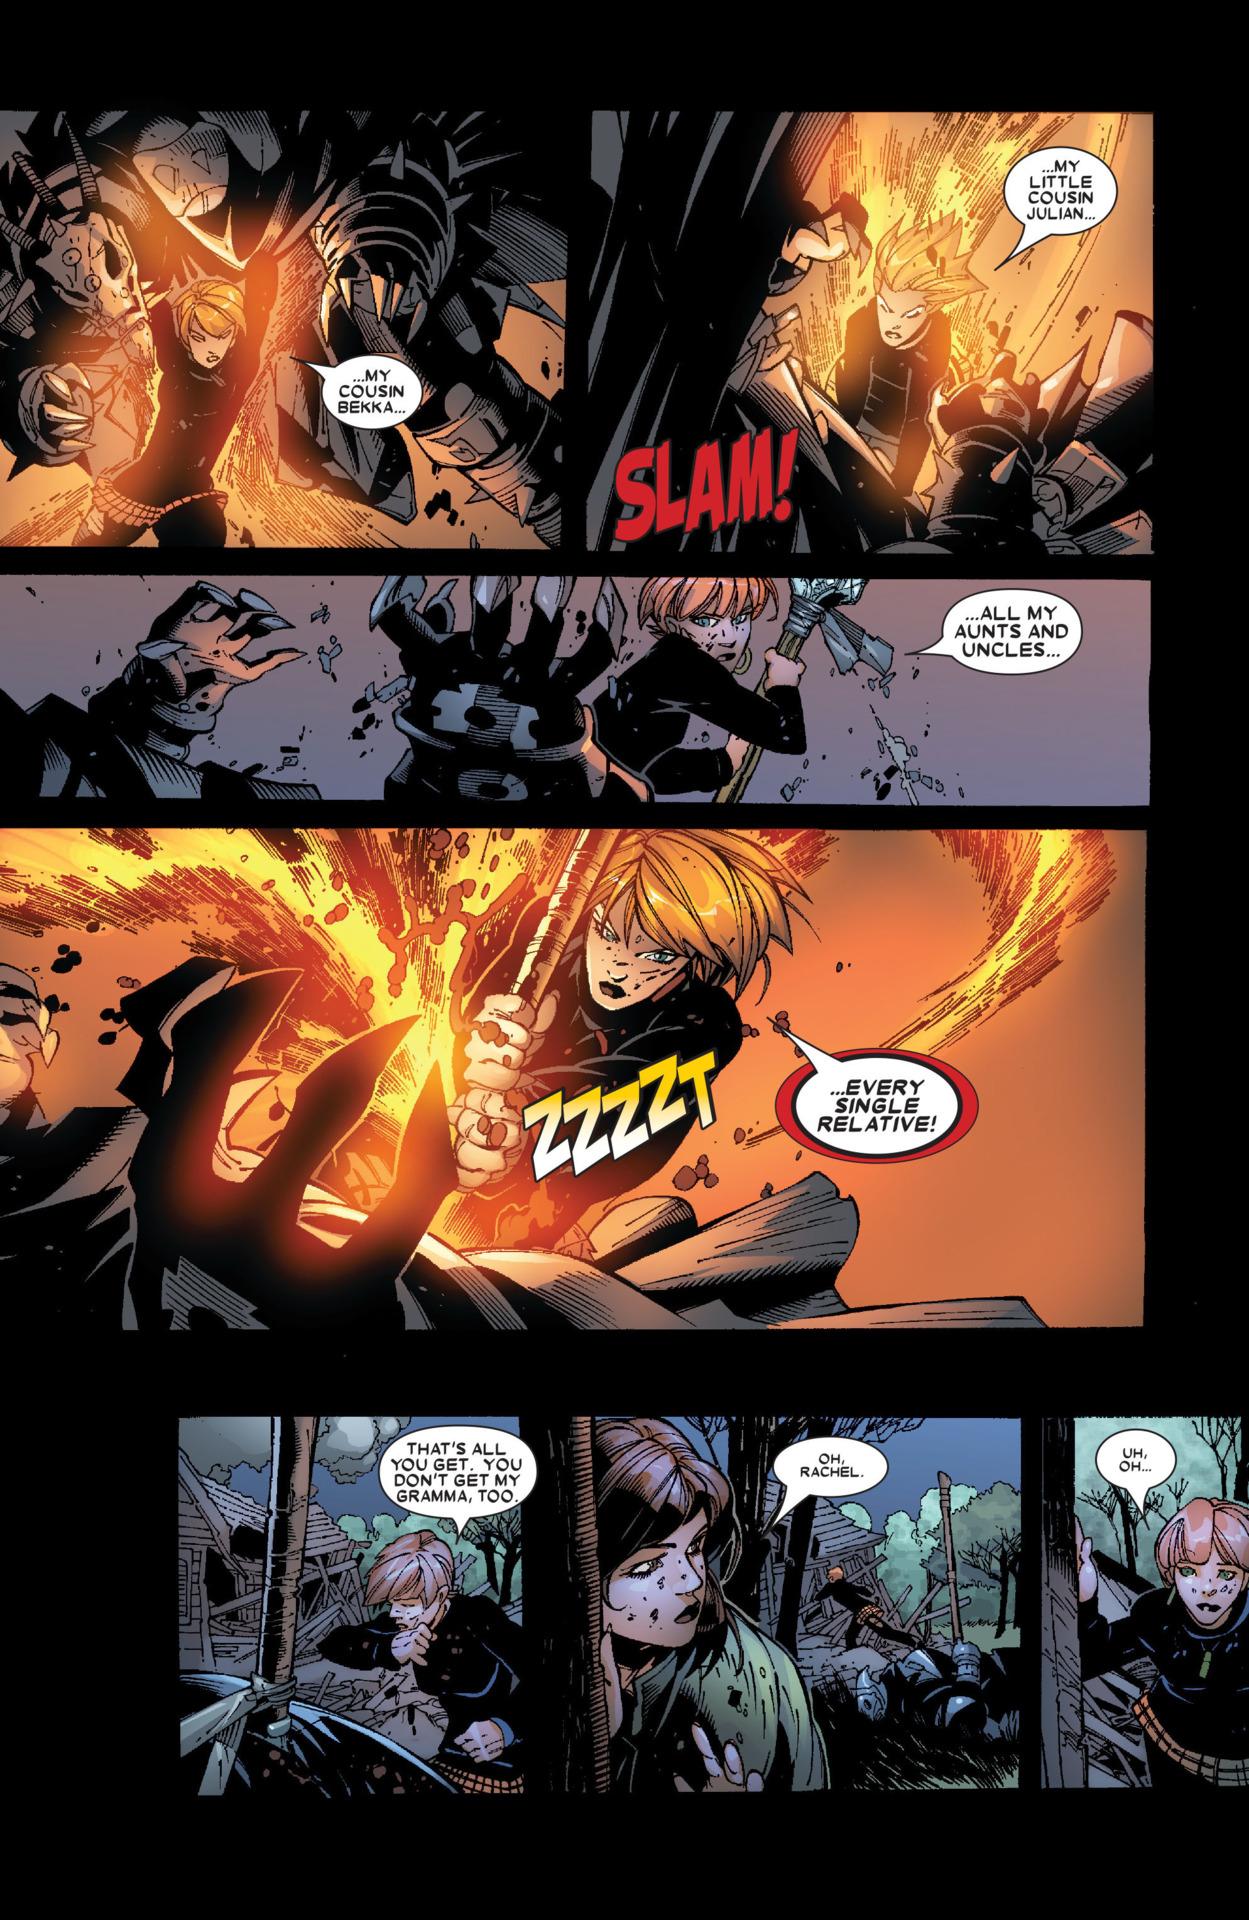 KO's Black Cloak, a Death Commando strong enough to over power Gladiator Uncanny X-Men v1 468